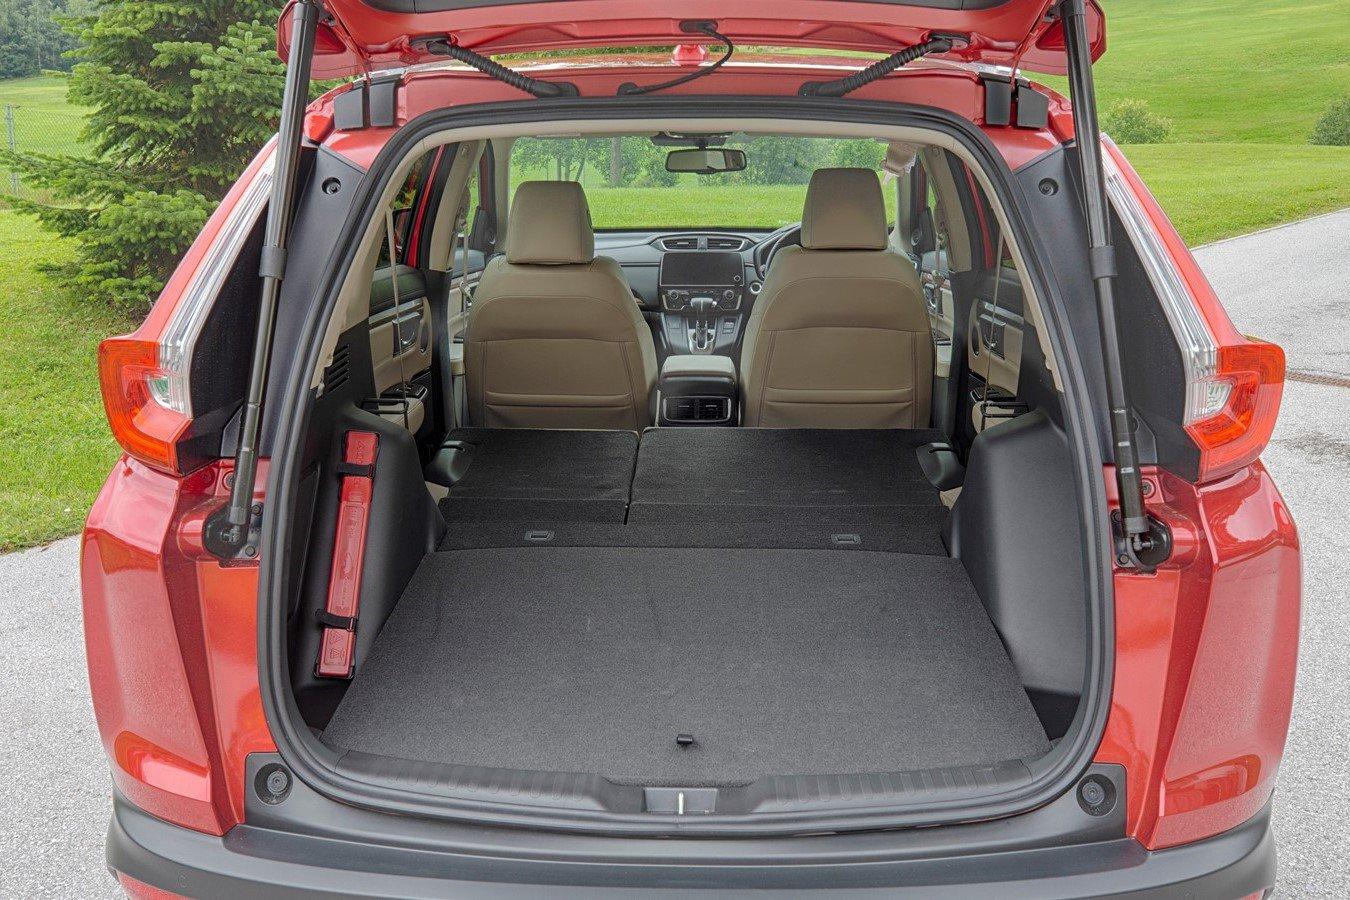 Honda CR-V luggage area